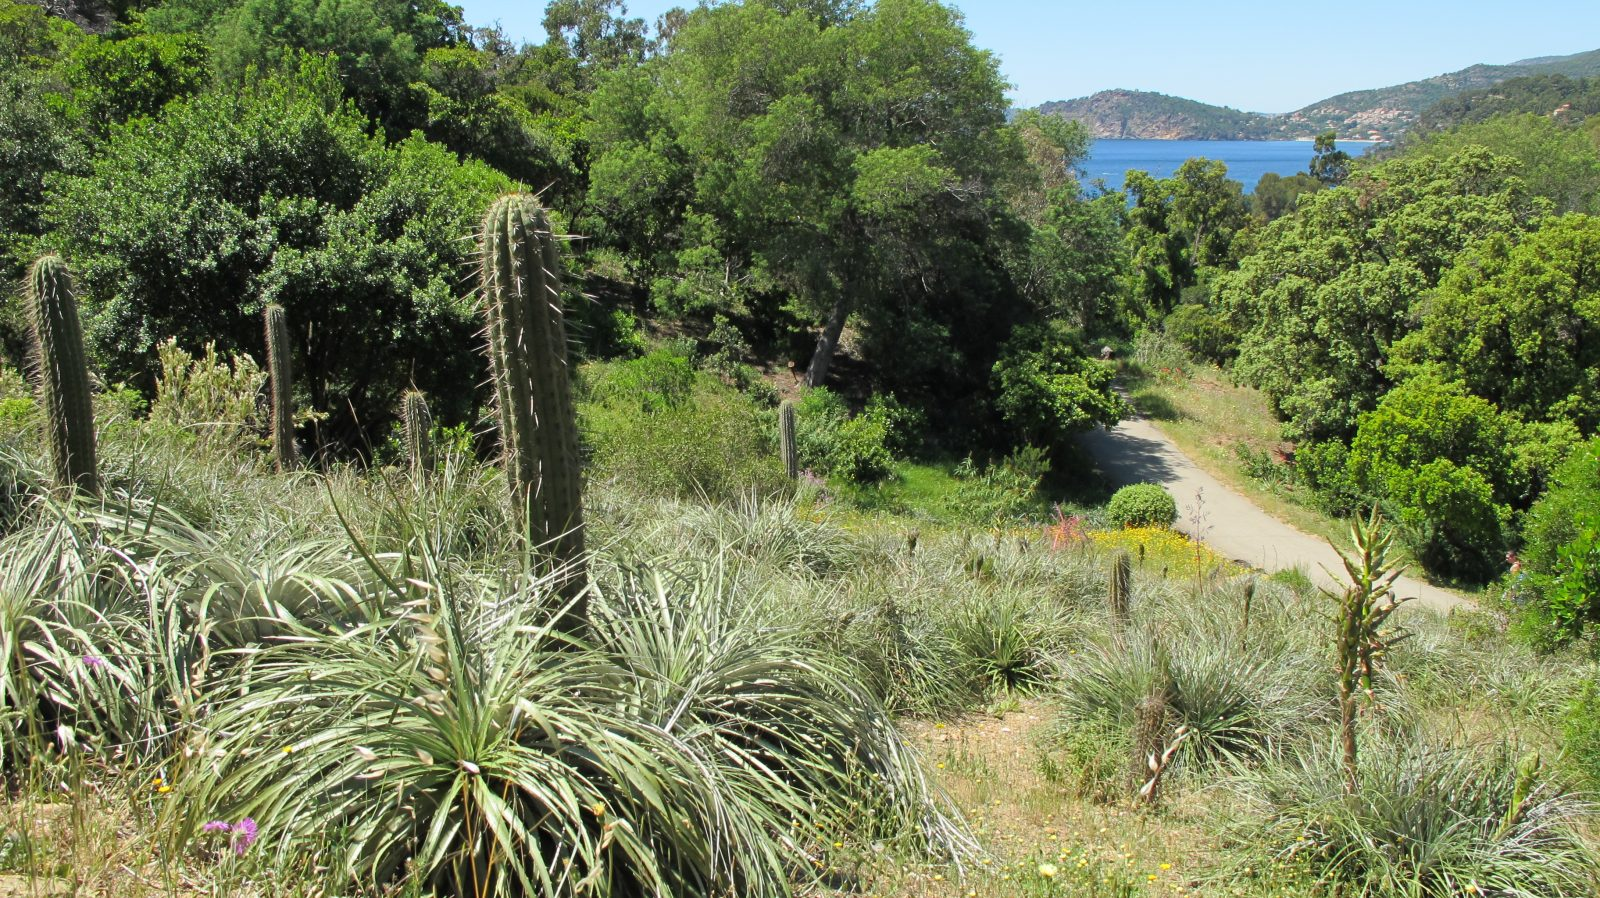 Domaine Du Rayol Le Jardin Des Mediterranees A Rayol Canadel Sur